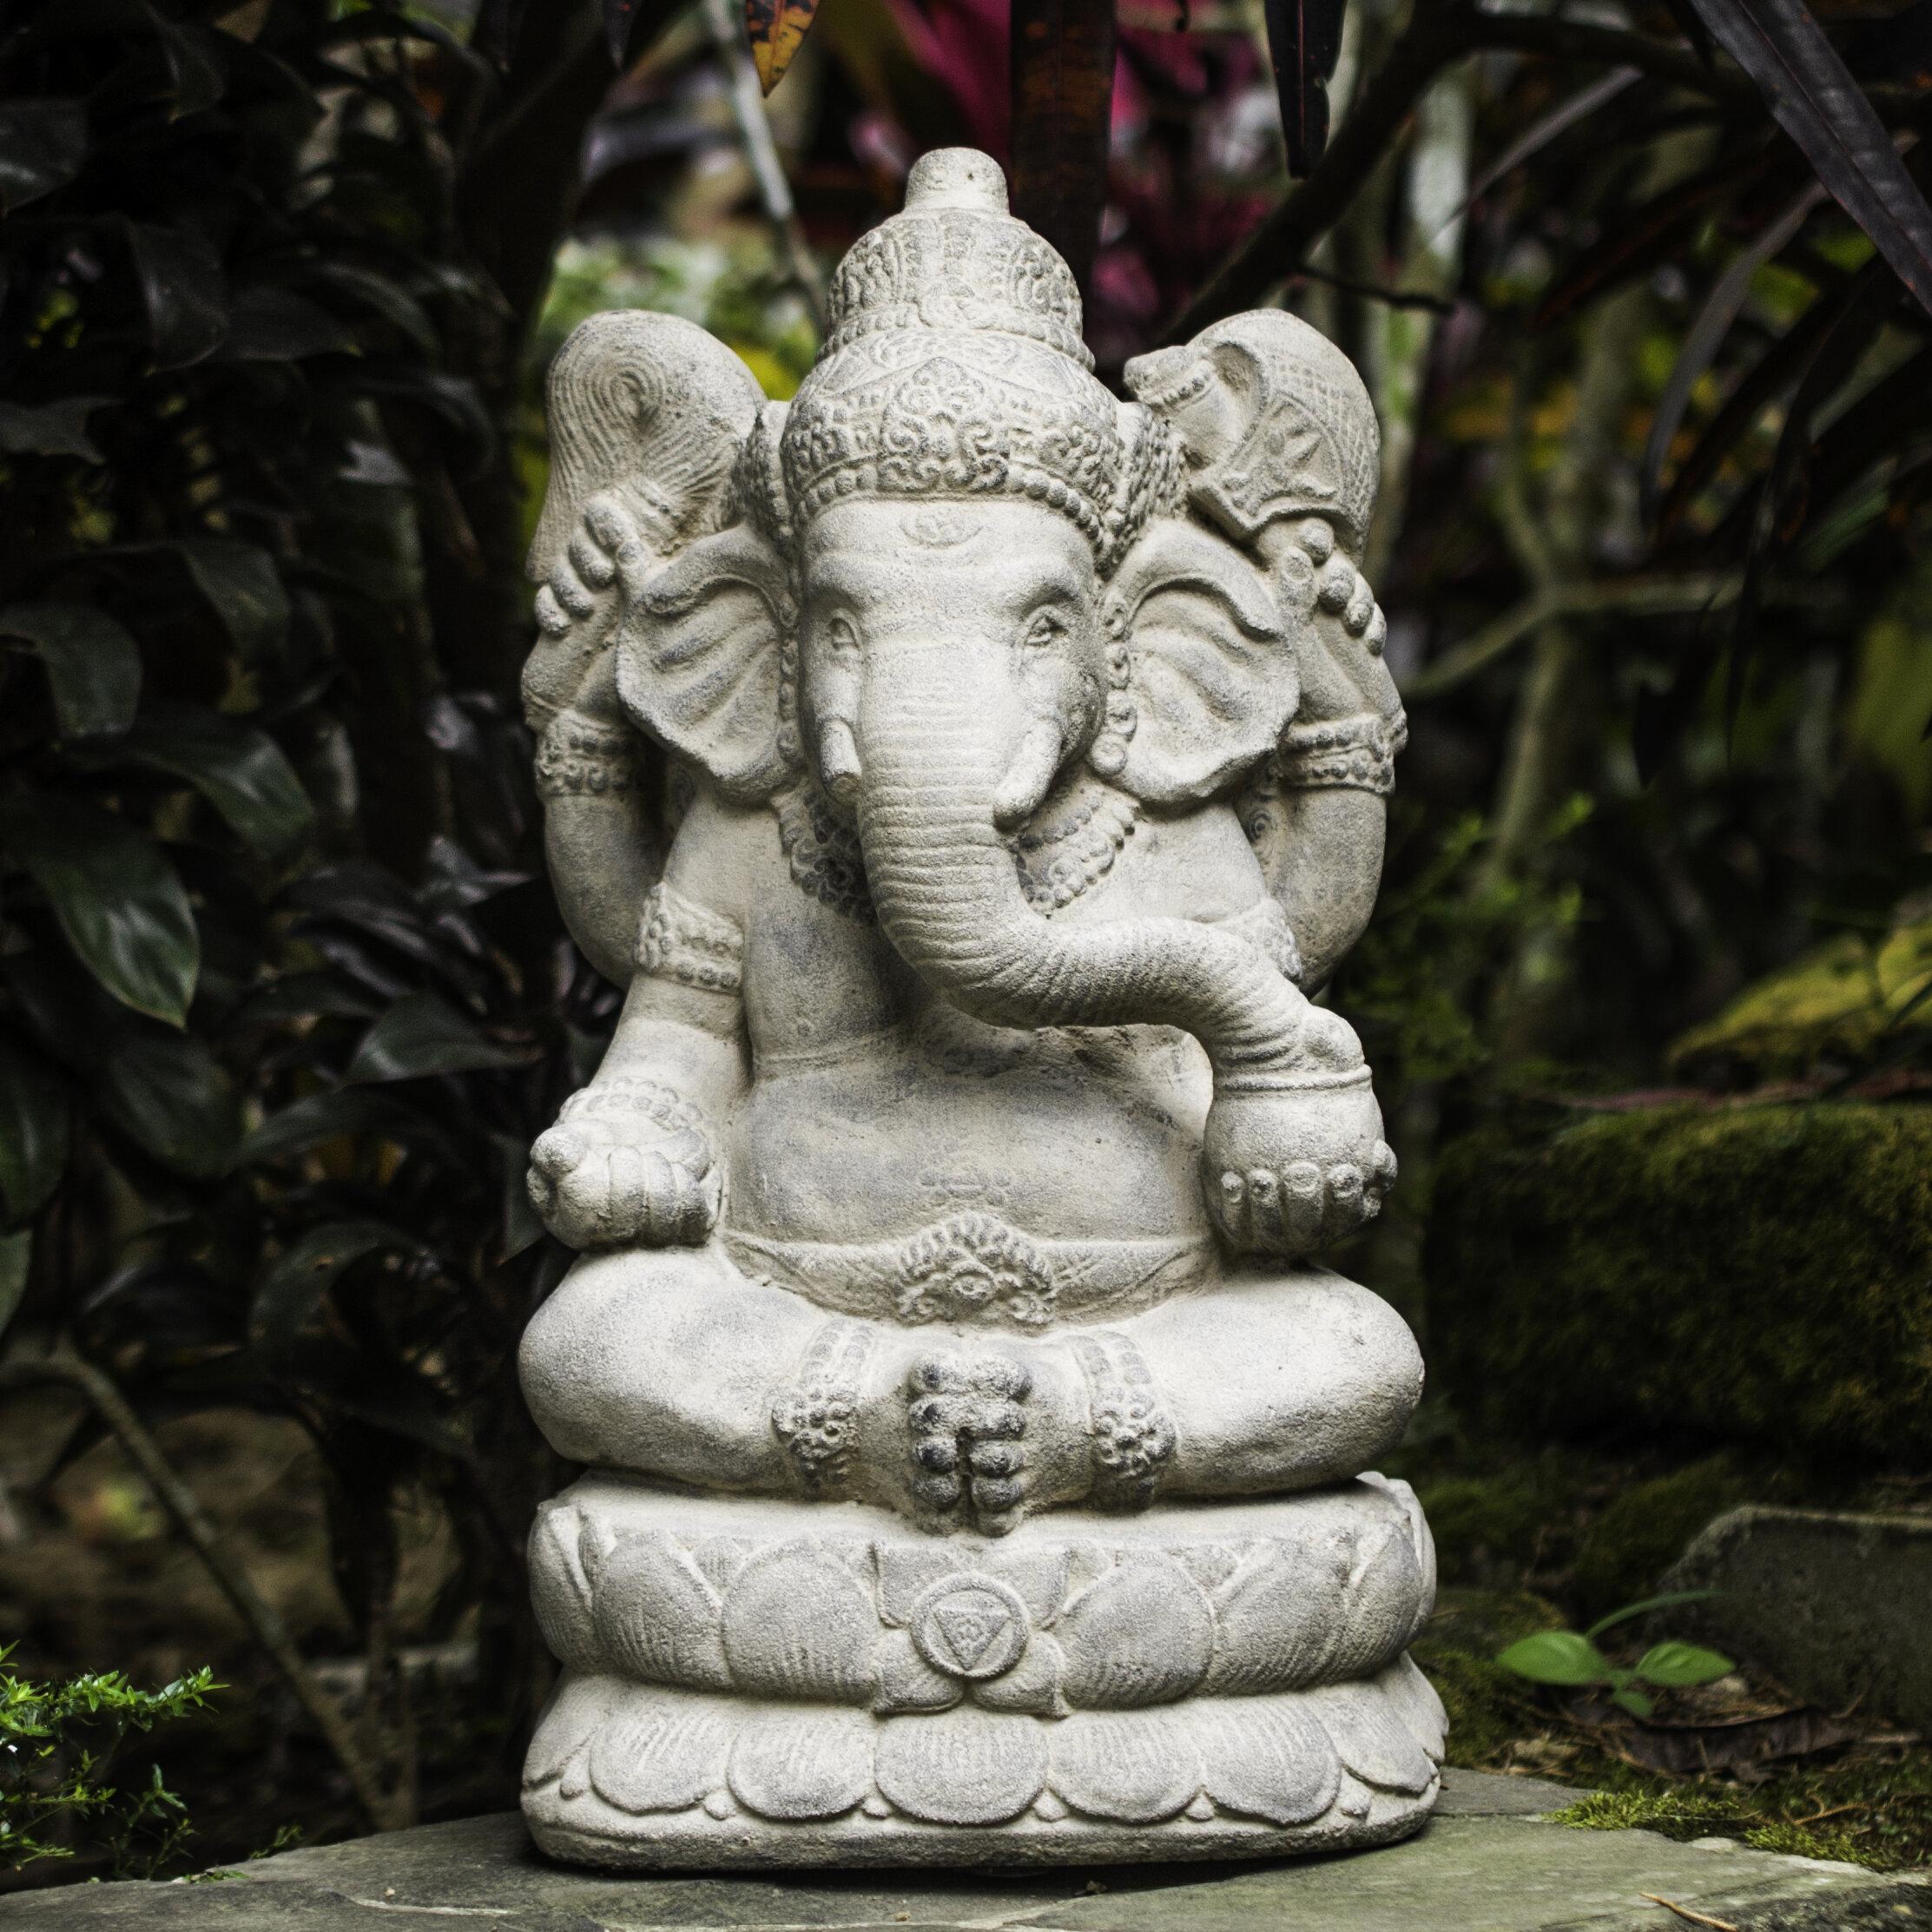 My spirit garden volcanic ash powerful ganesha statue & reviews